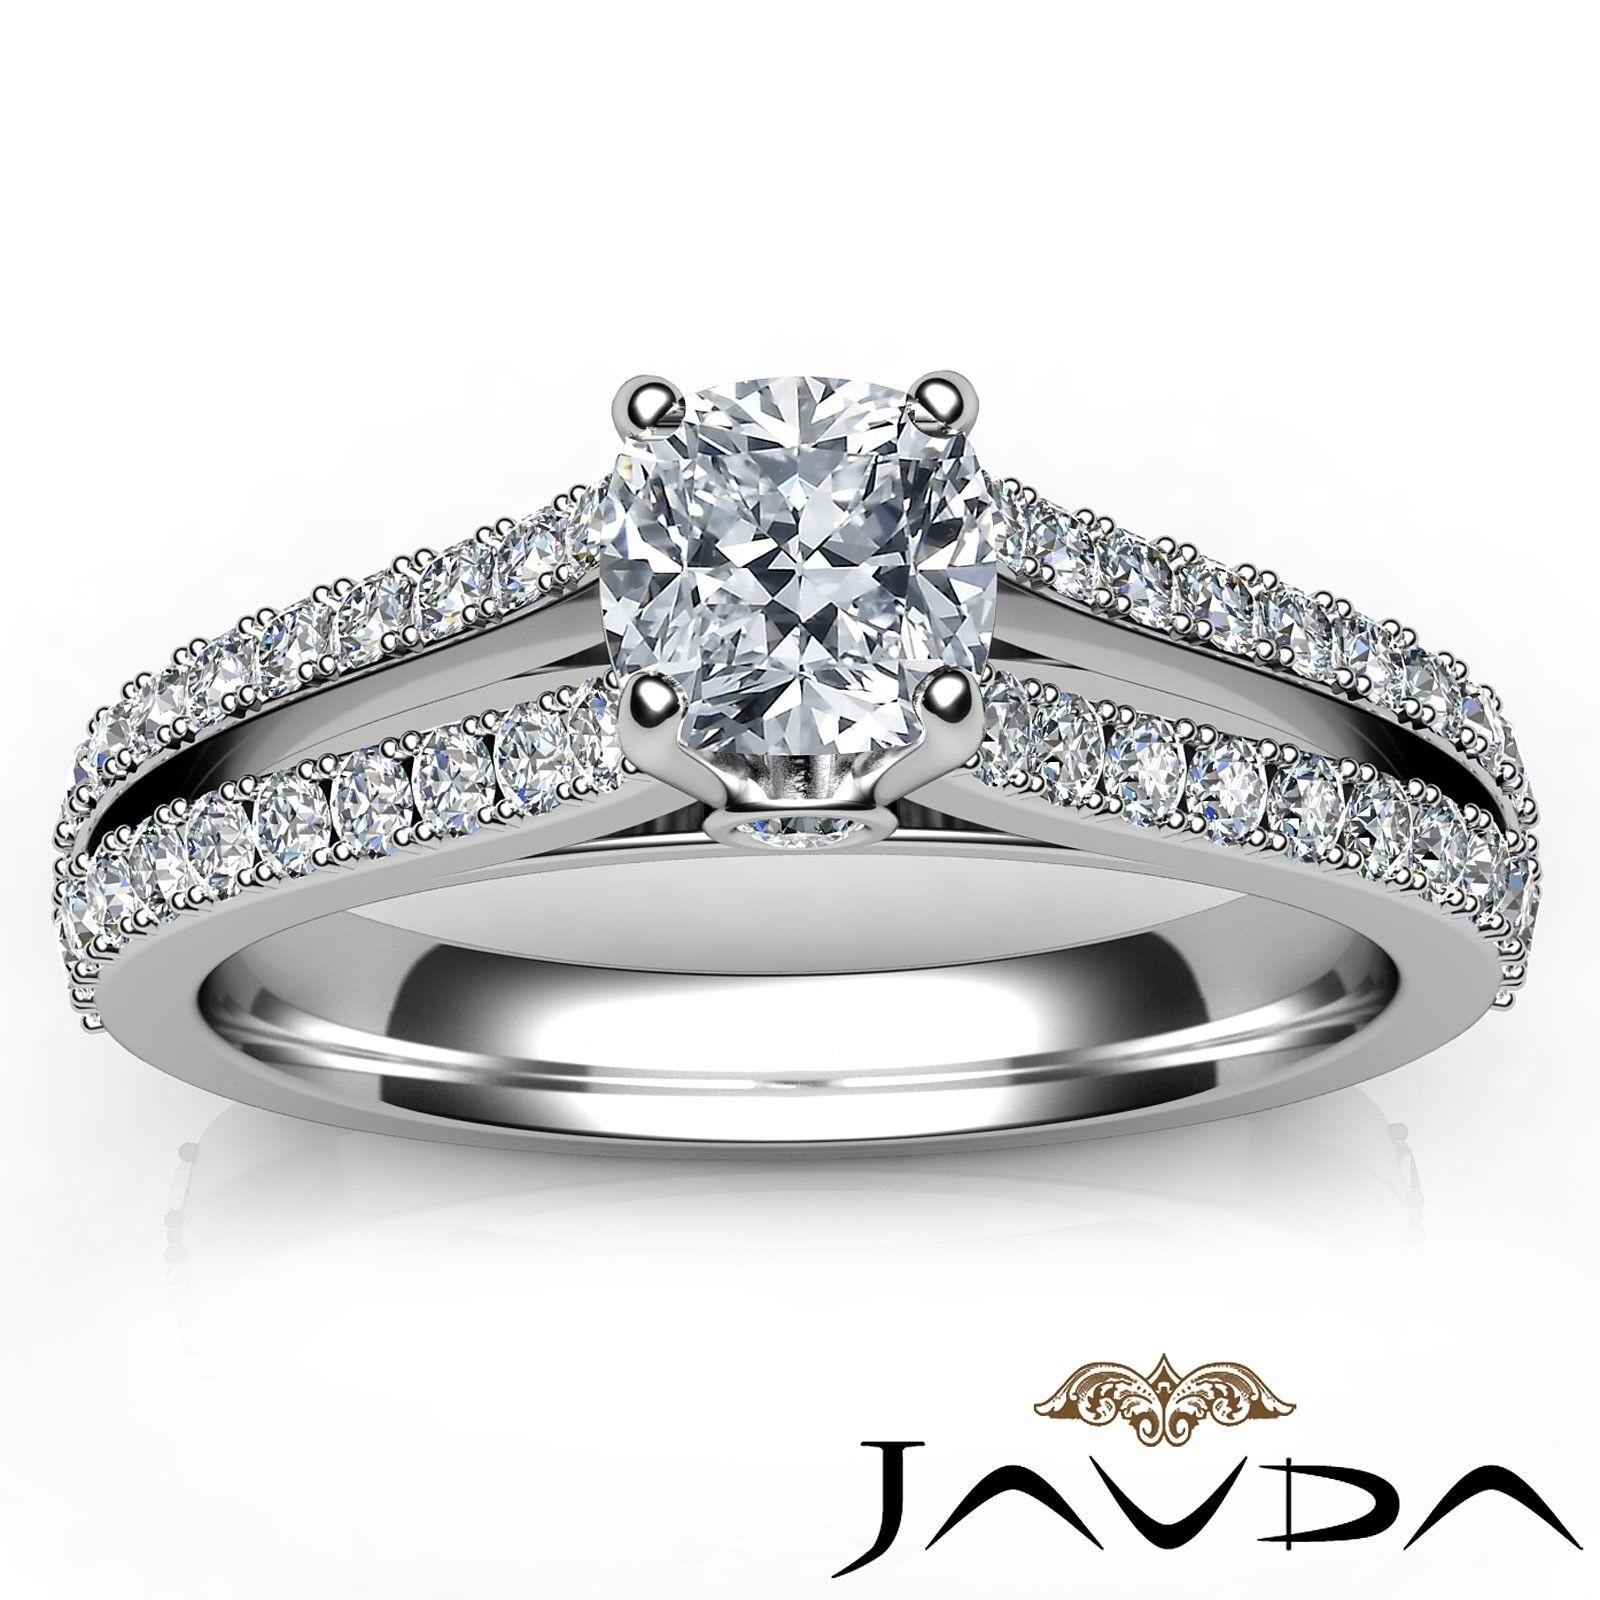 1.29ctw Double Prong Split Shank Cushion Diamond Engagement Ring GIA H-VS2  Gold 6